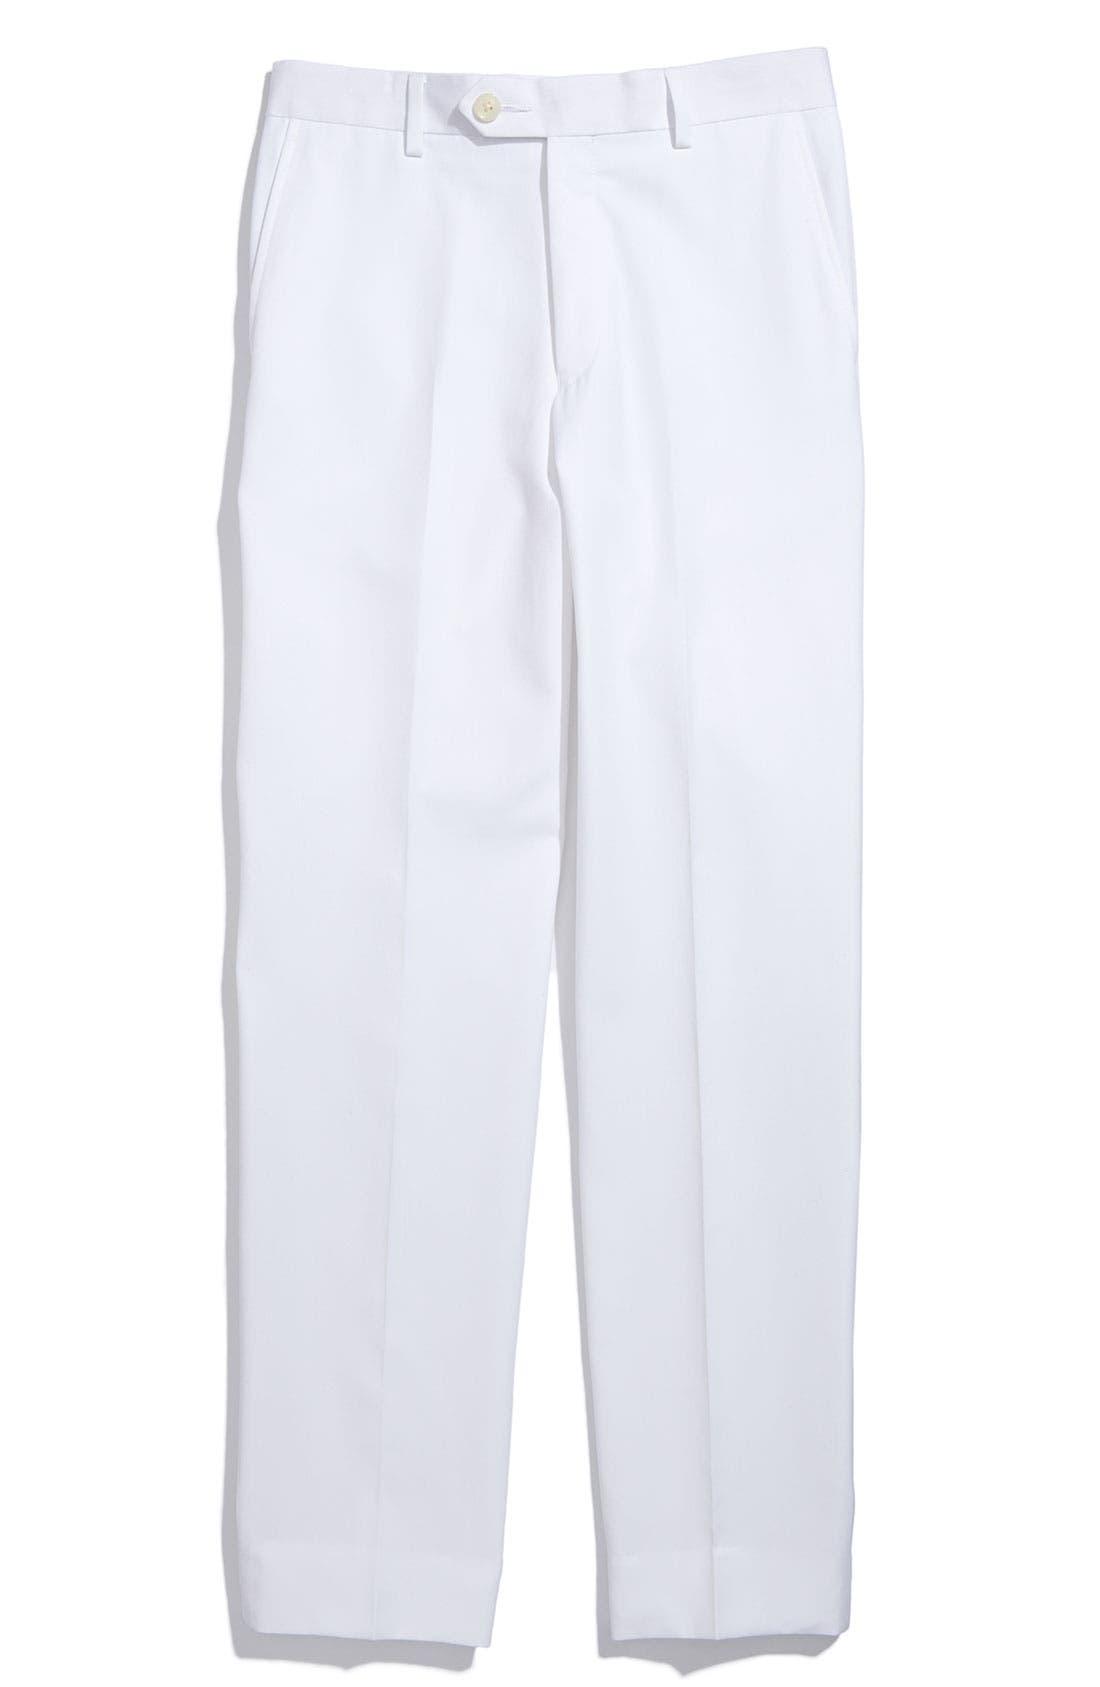 Alternate Image 1 Selected - Joseph Abboud Flat Front Dress Pants (Little Boys, Big Boys & Husky)